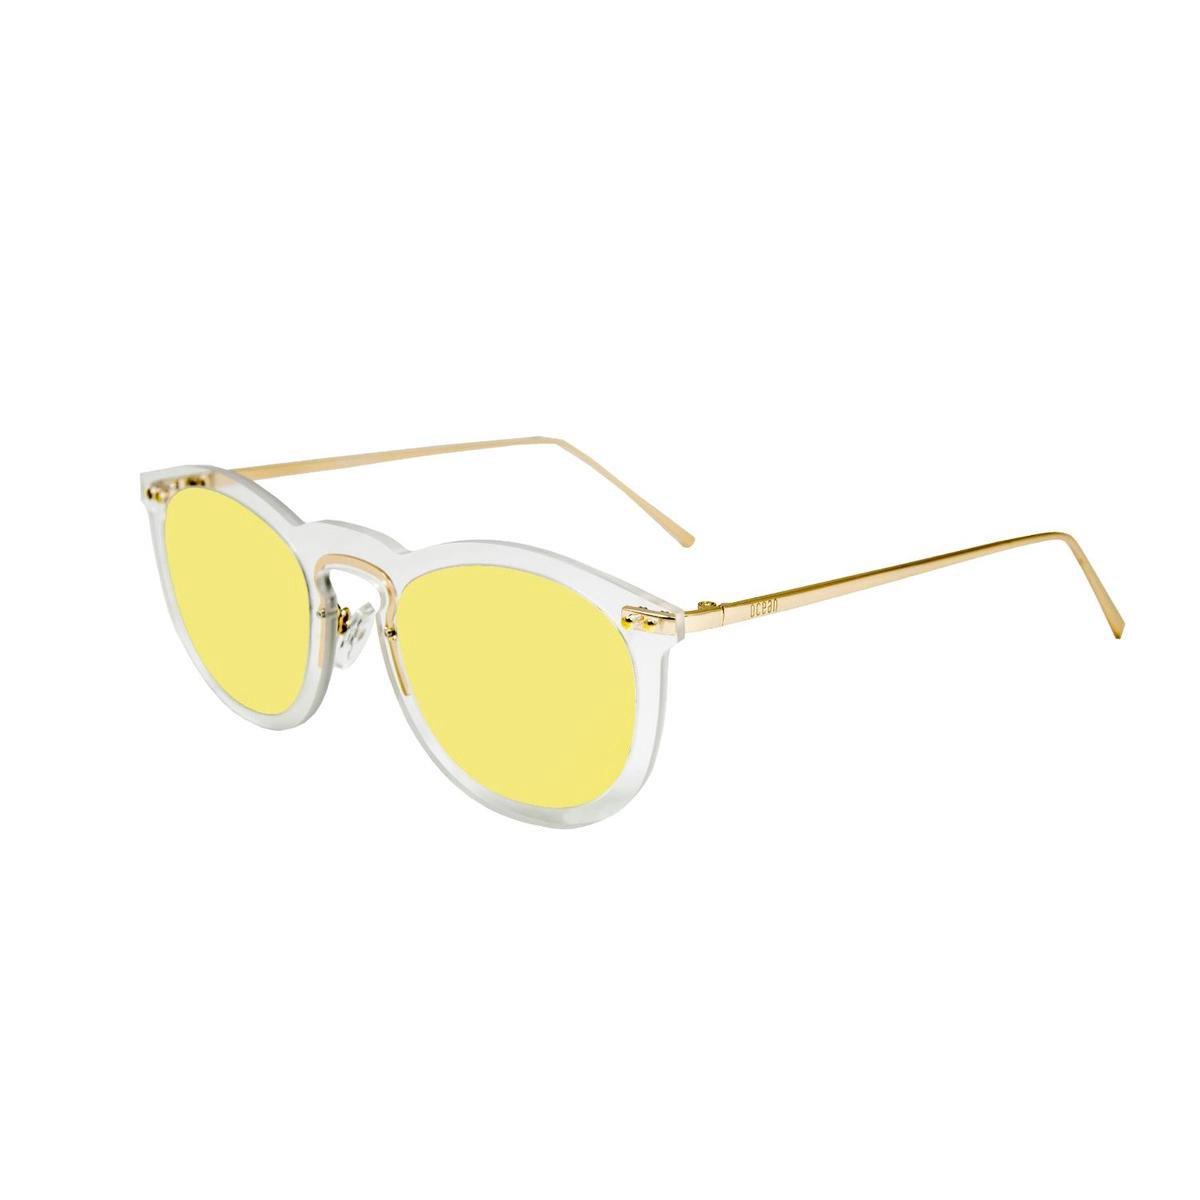 Ocean Sunglasses - HELSINKI - Unisex Zonnebril Geel - Ocean Sunglasses